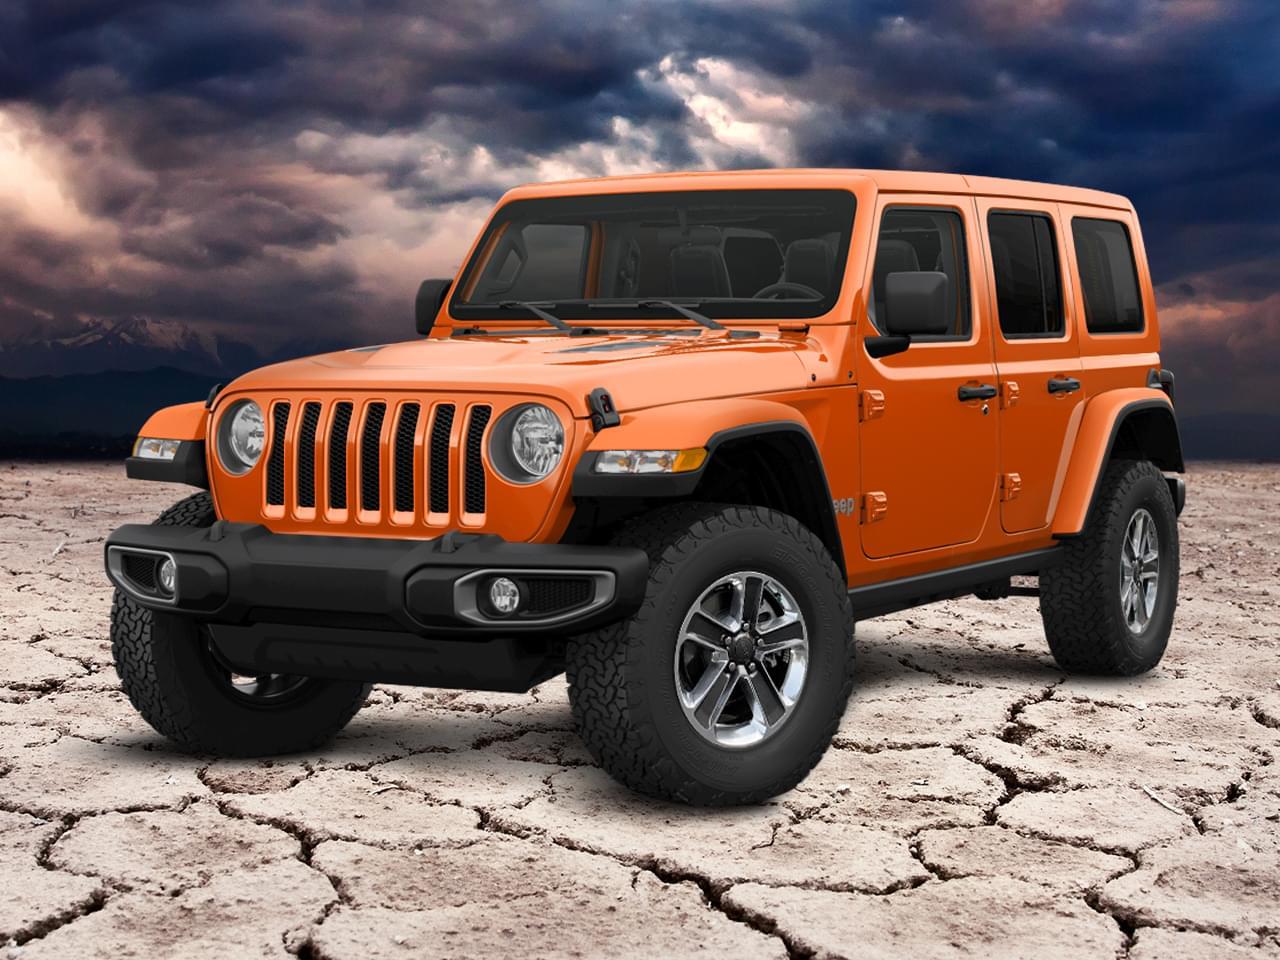 Jeep Wrangler Unlimited 2.2 CRDi Sahara 200PS 4x4 AT8